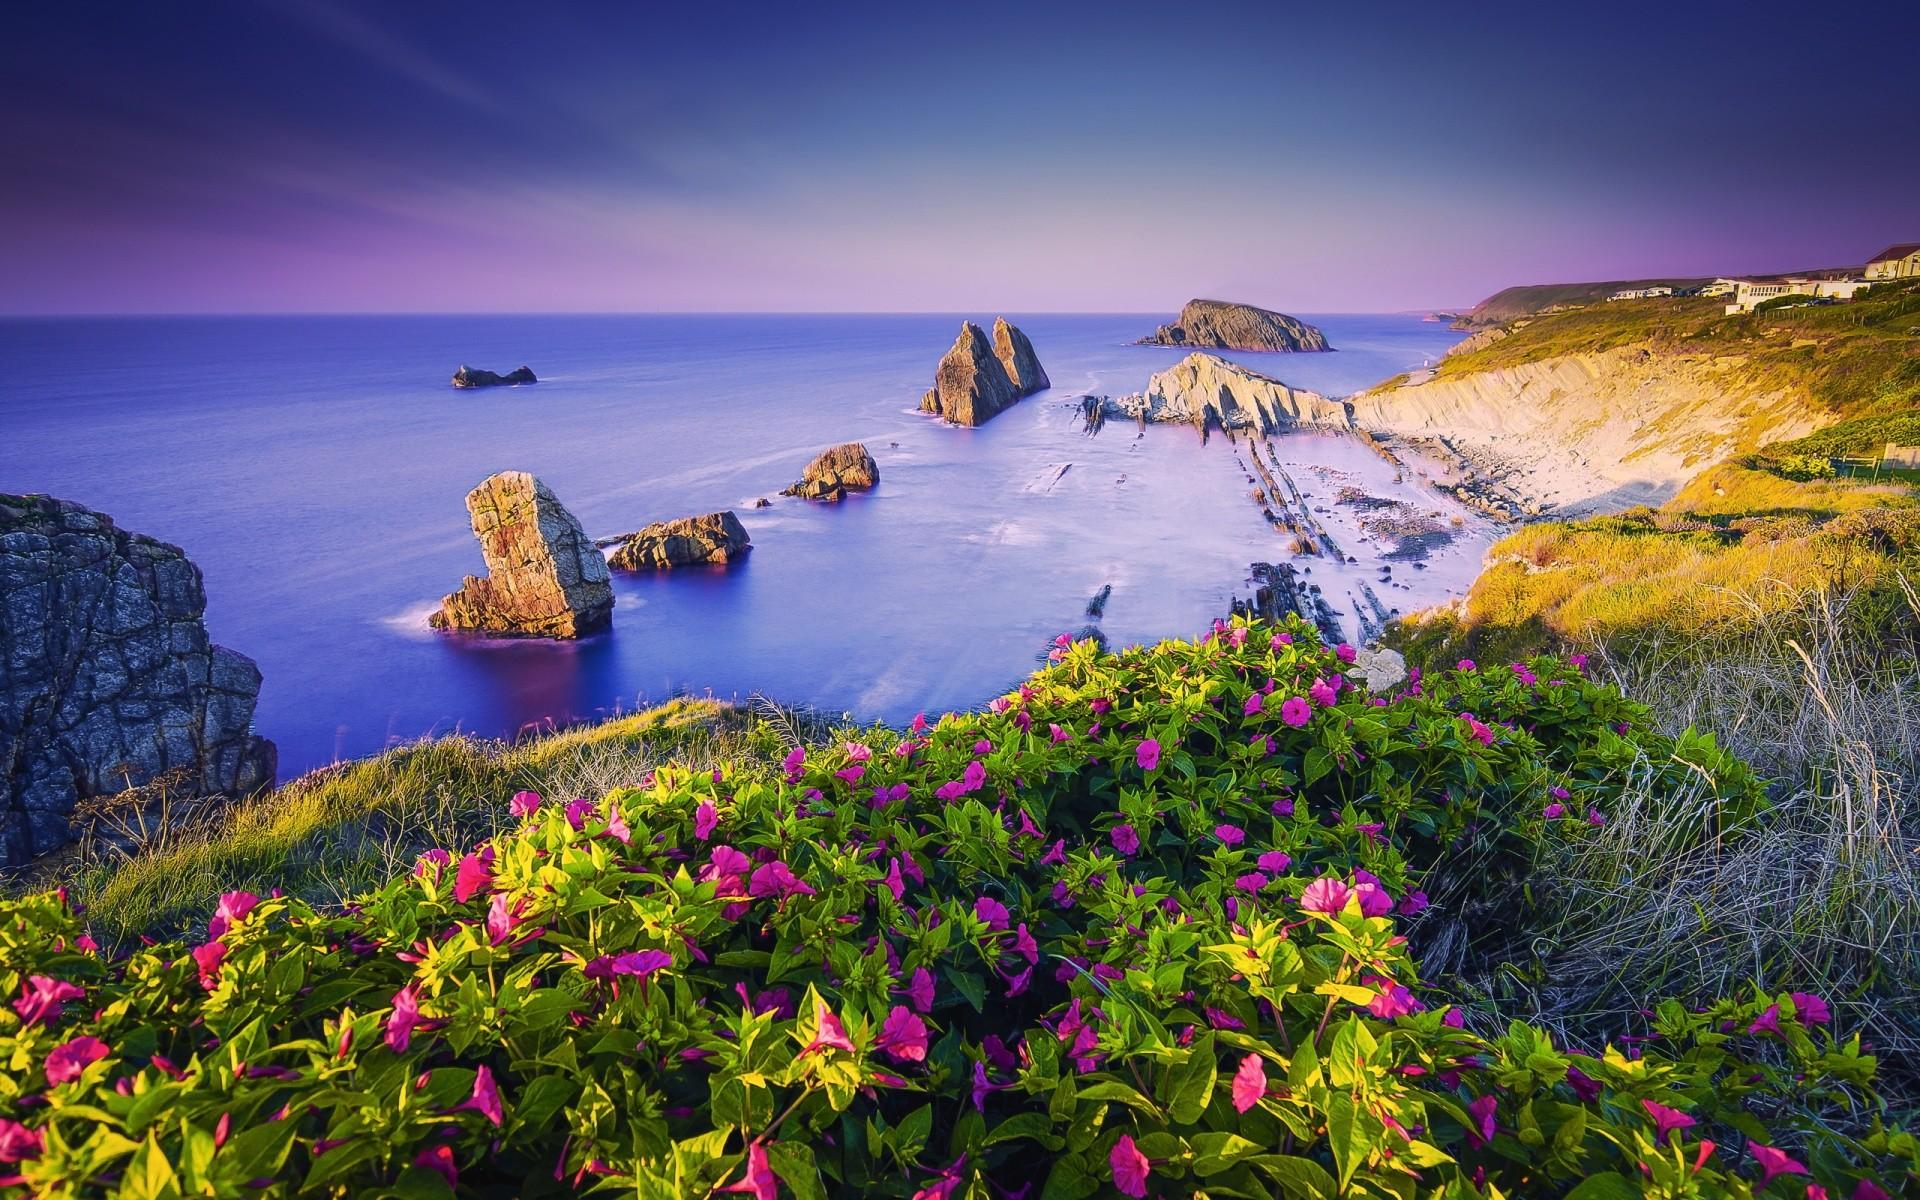 Free Costa Quebrada Cantabria Spain Coast phone wallpaper by kamiplayer